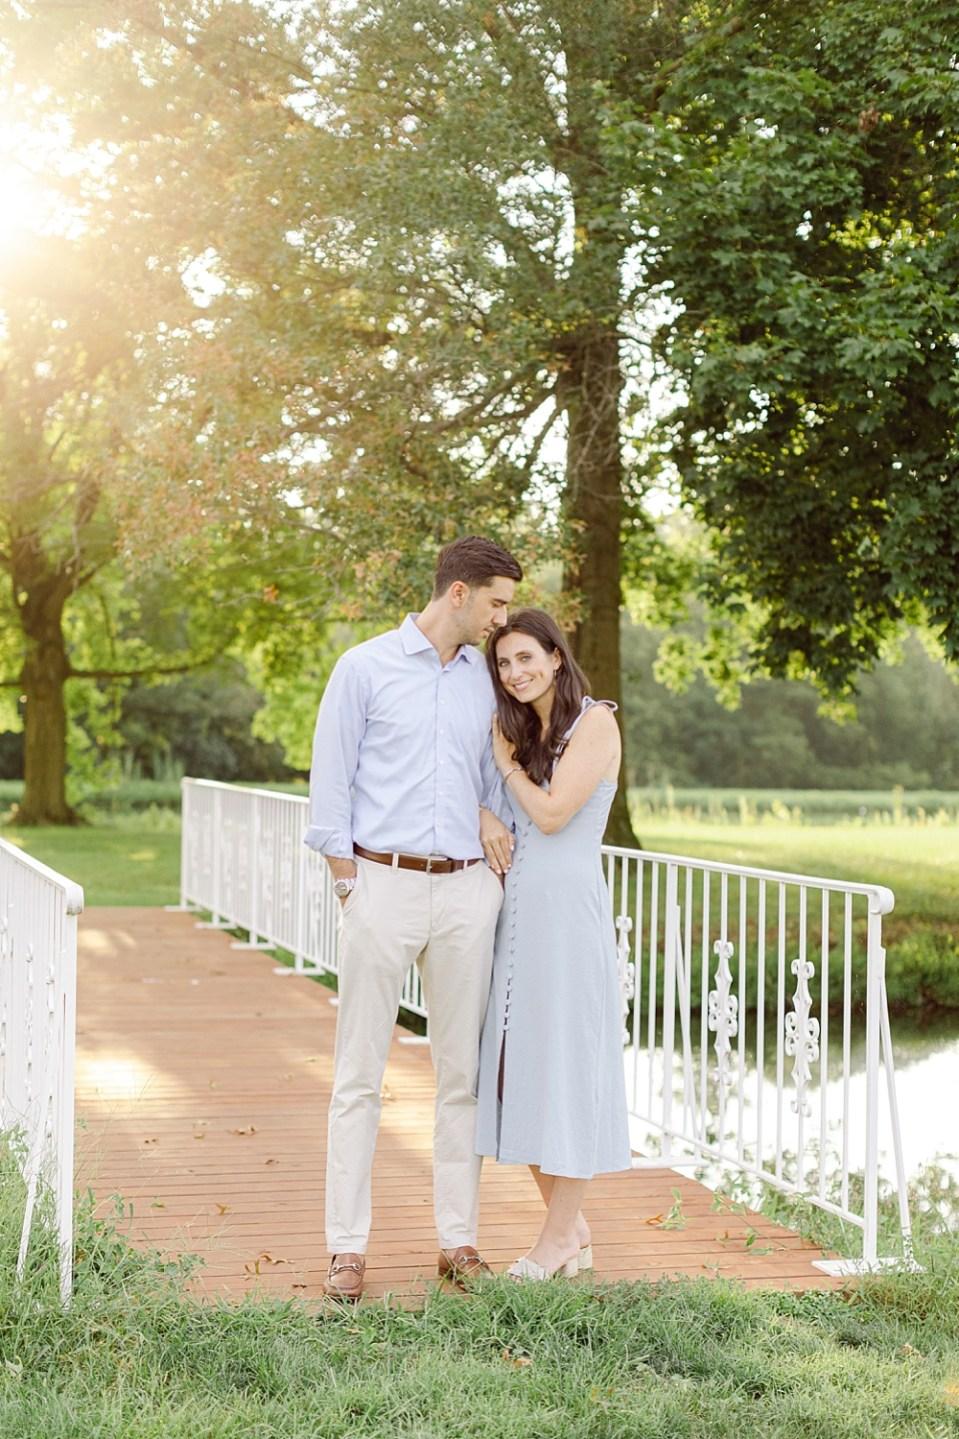 pennsylvania wedding photographer sarah canning   beechdale farms engagement